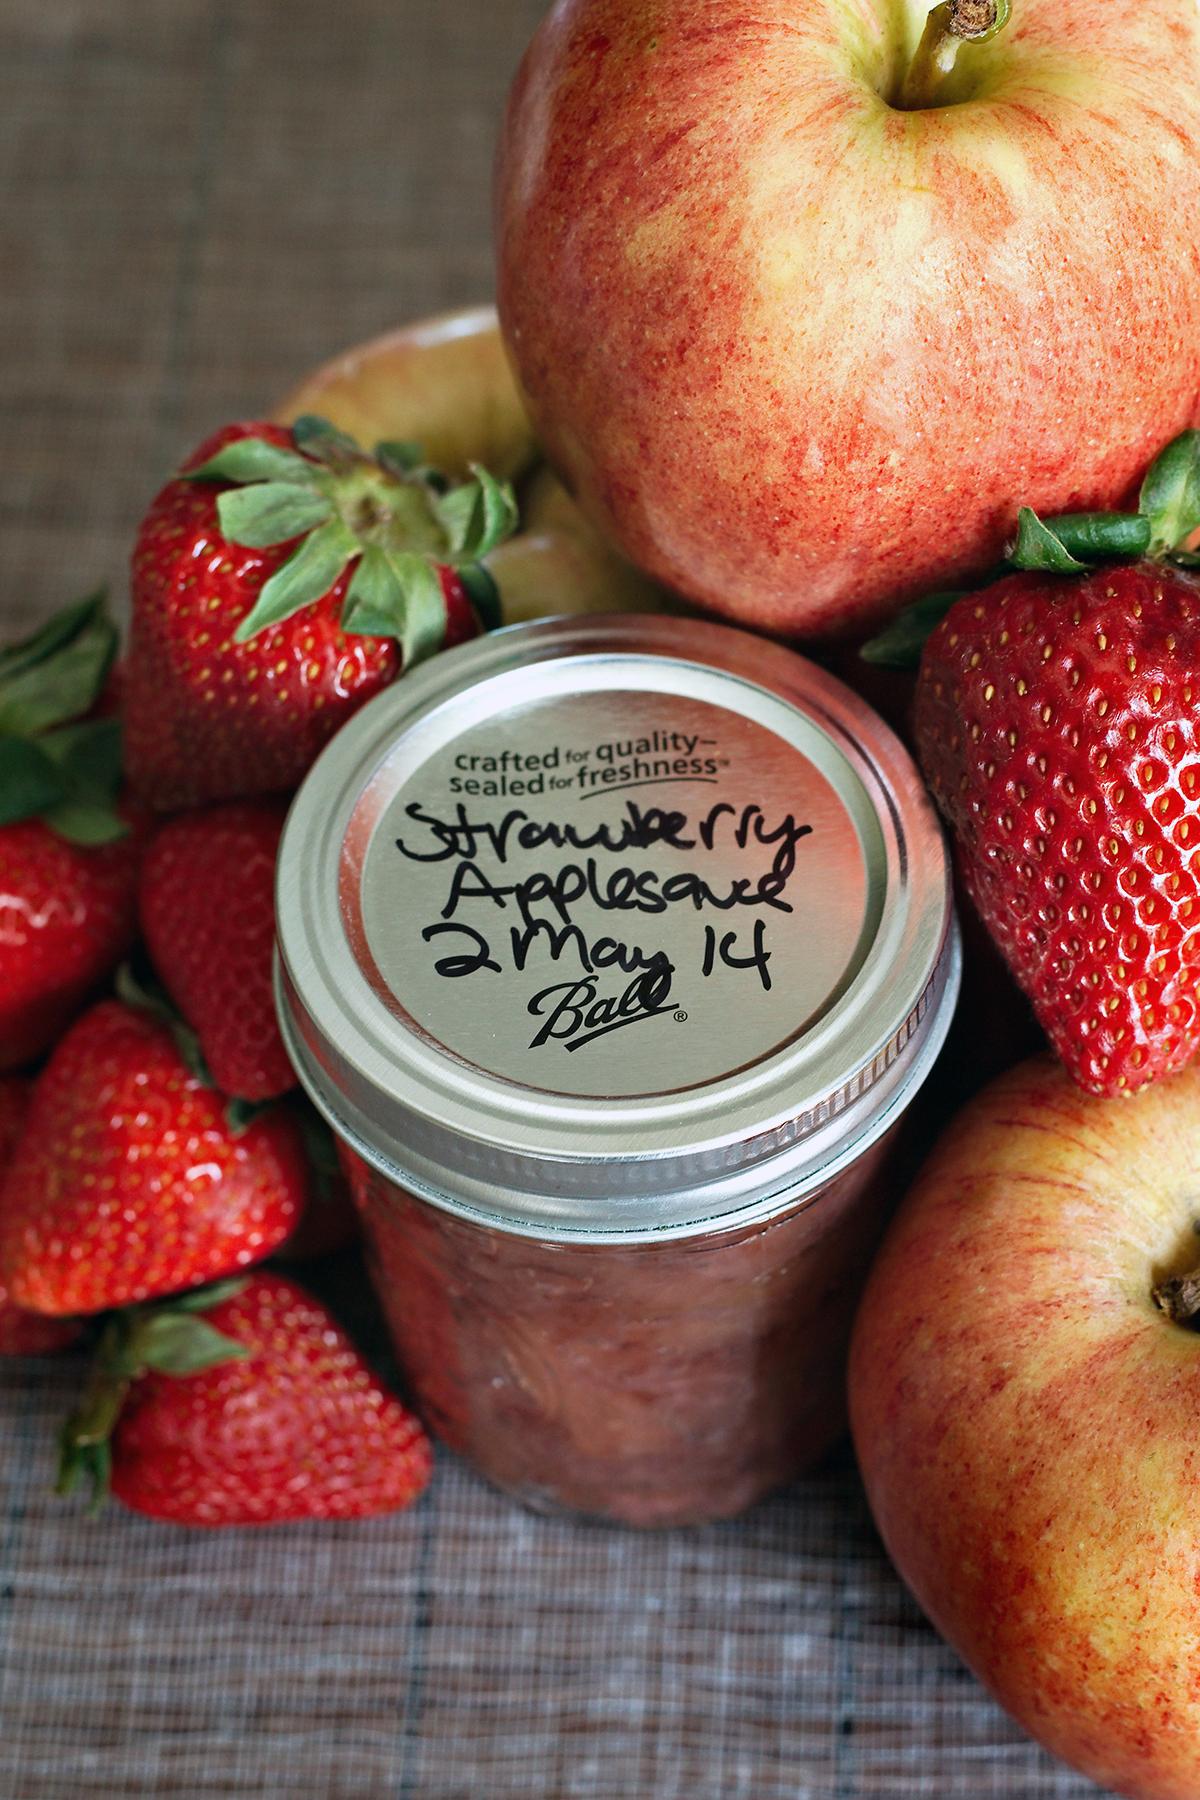 StrawberryApplesauce.jpg